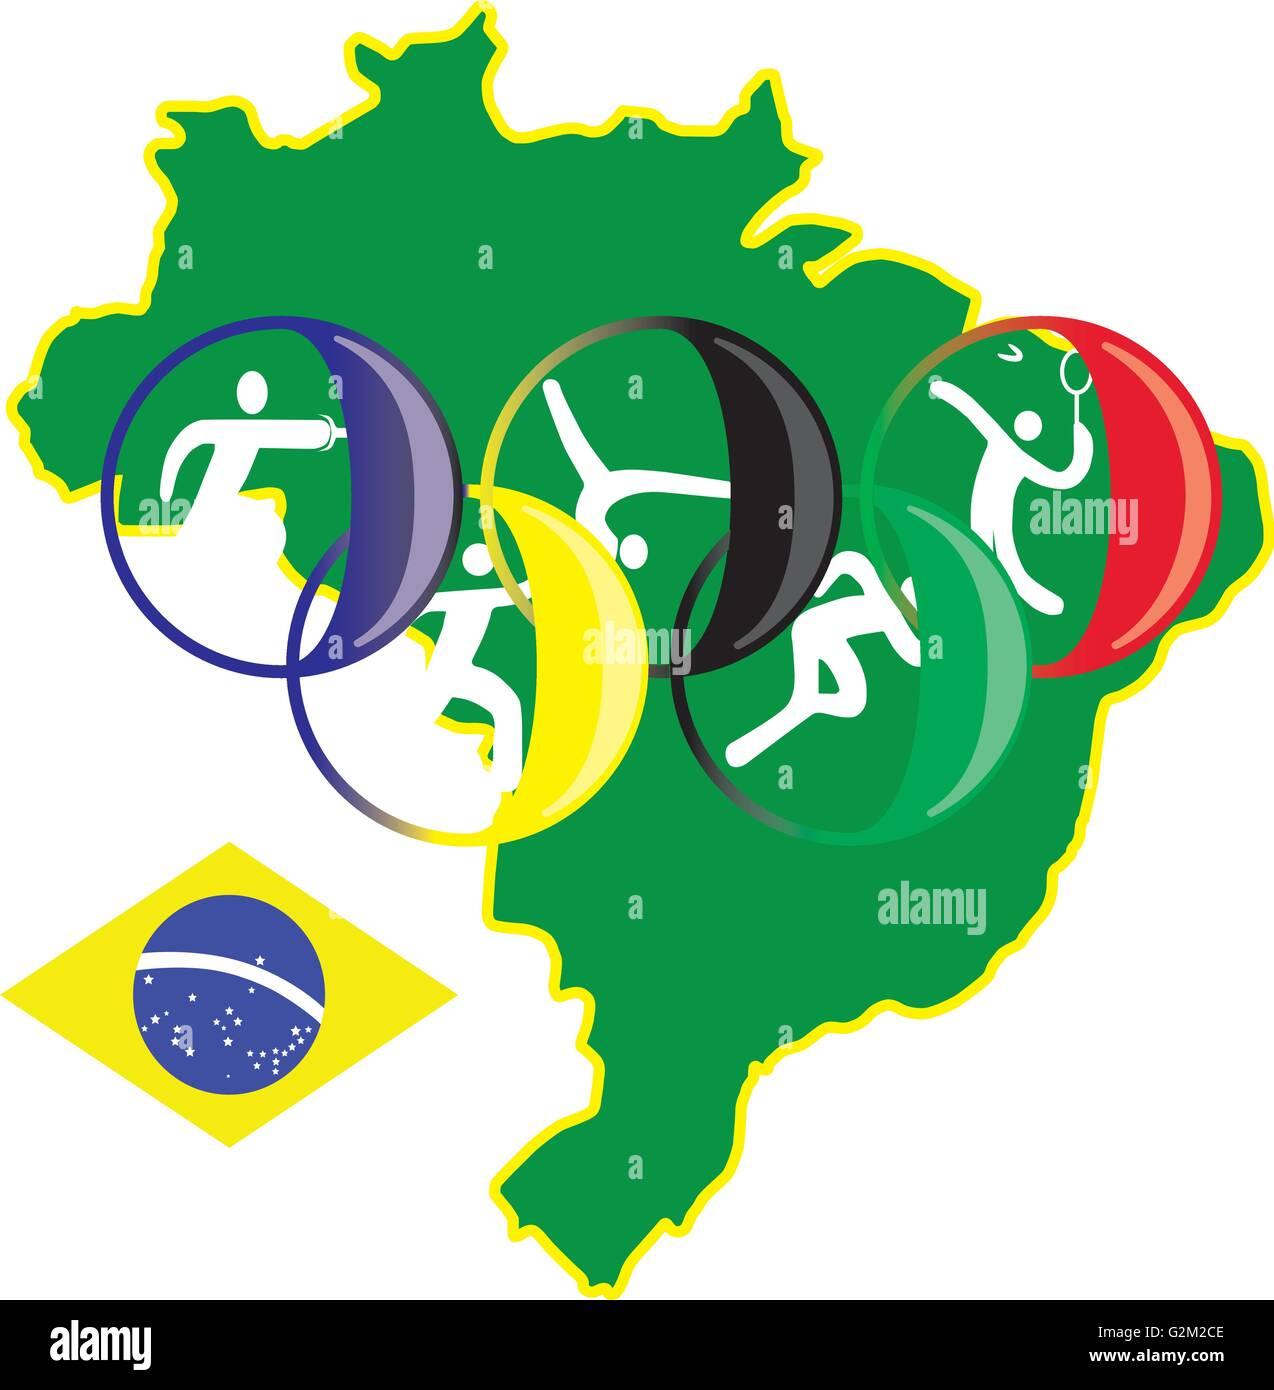 brasilia sport 2016 - Stock Vector